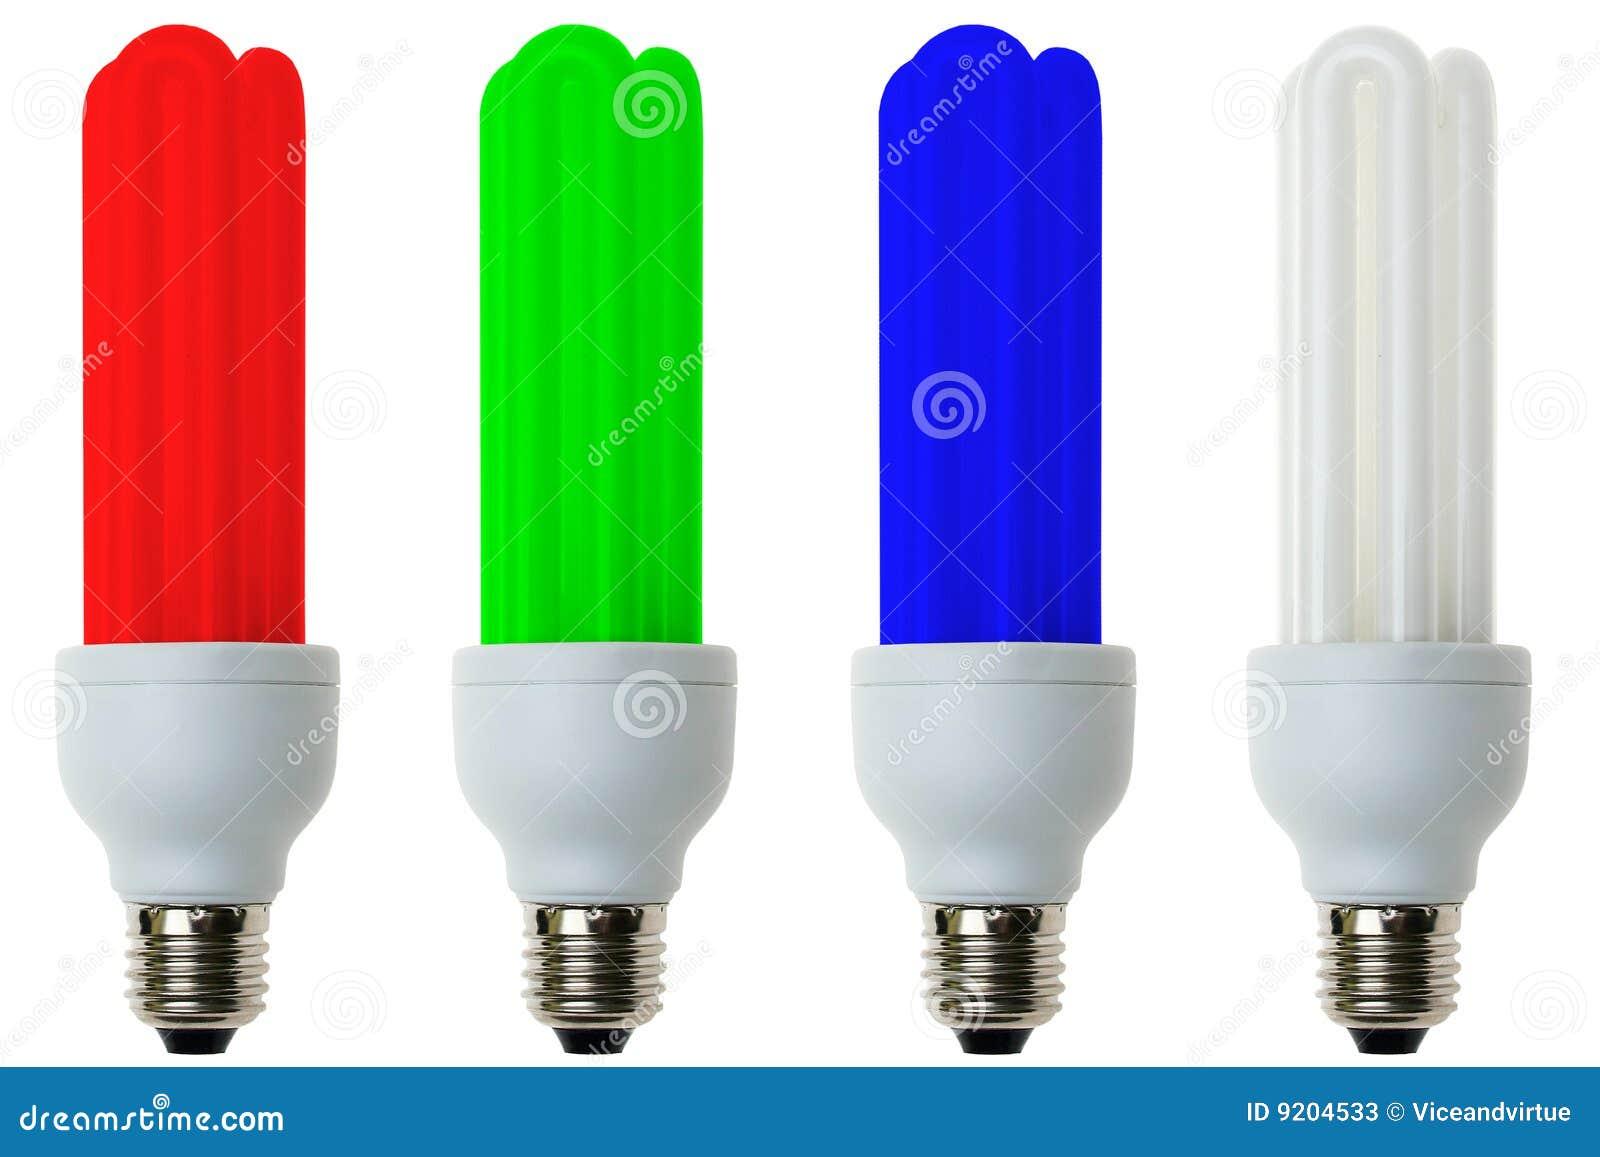 rgb fluorescent light bulbs stock photos - Colored Light Bulbs